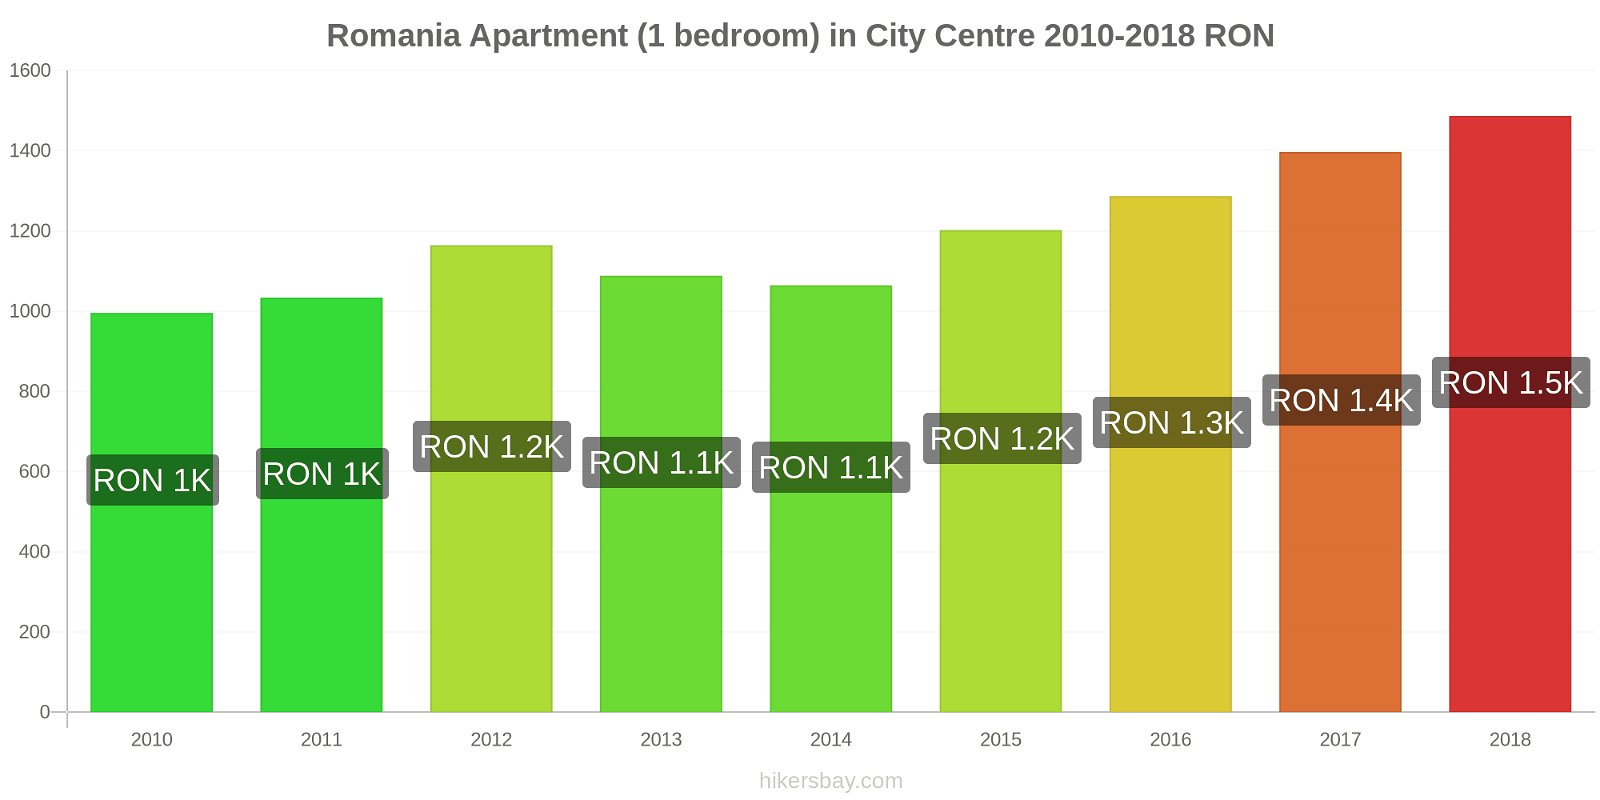 Romania price changes Apartment (1 bedroom) in City Centre hikersbay.com